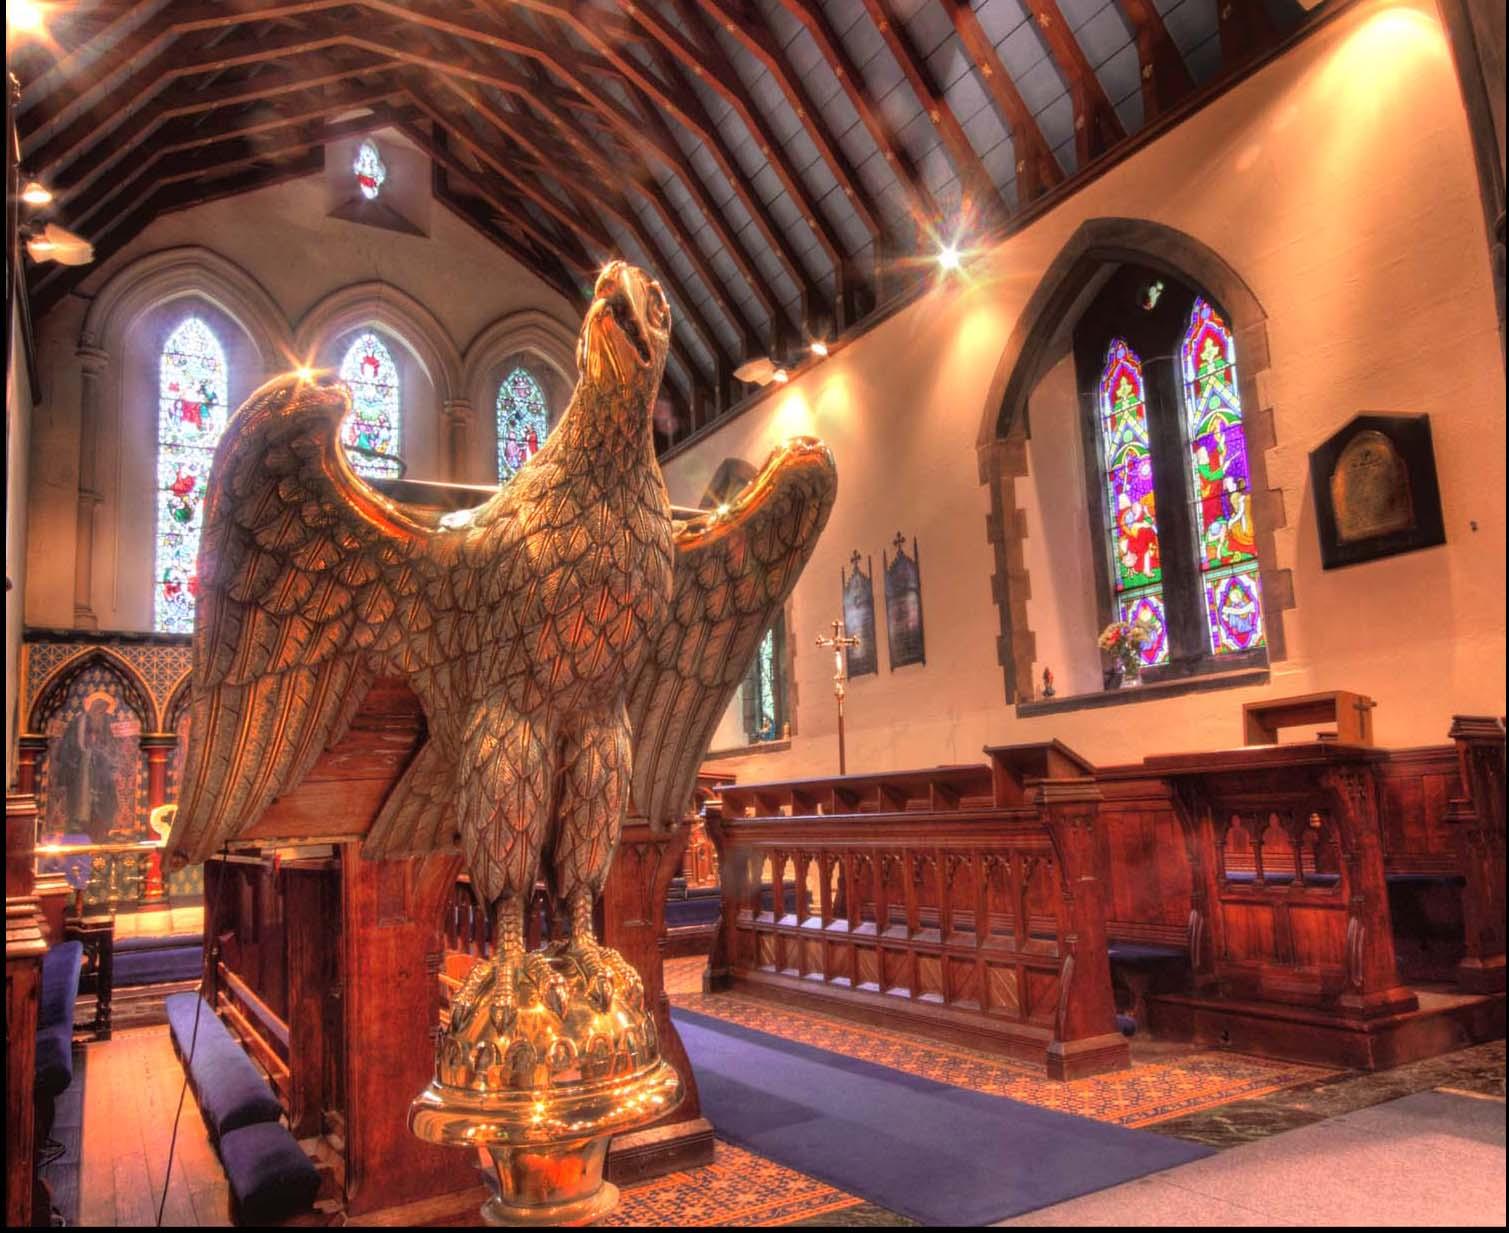 All Saints Church Thelwall,warrington cheshire anglican golden eagle lecturn,365days,HDR,high dynamic range,all,saints,church,drive,ghost,pictures,thelwall,warrington,anglican,cheshire,golden,eagle,lecturn,rare,valuable,england,uk,britain,gb,interior,inside,Hotpicks,hotpics,hotpix!,#HotpixUK,#TonySmith,#TonySmithHotpix